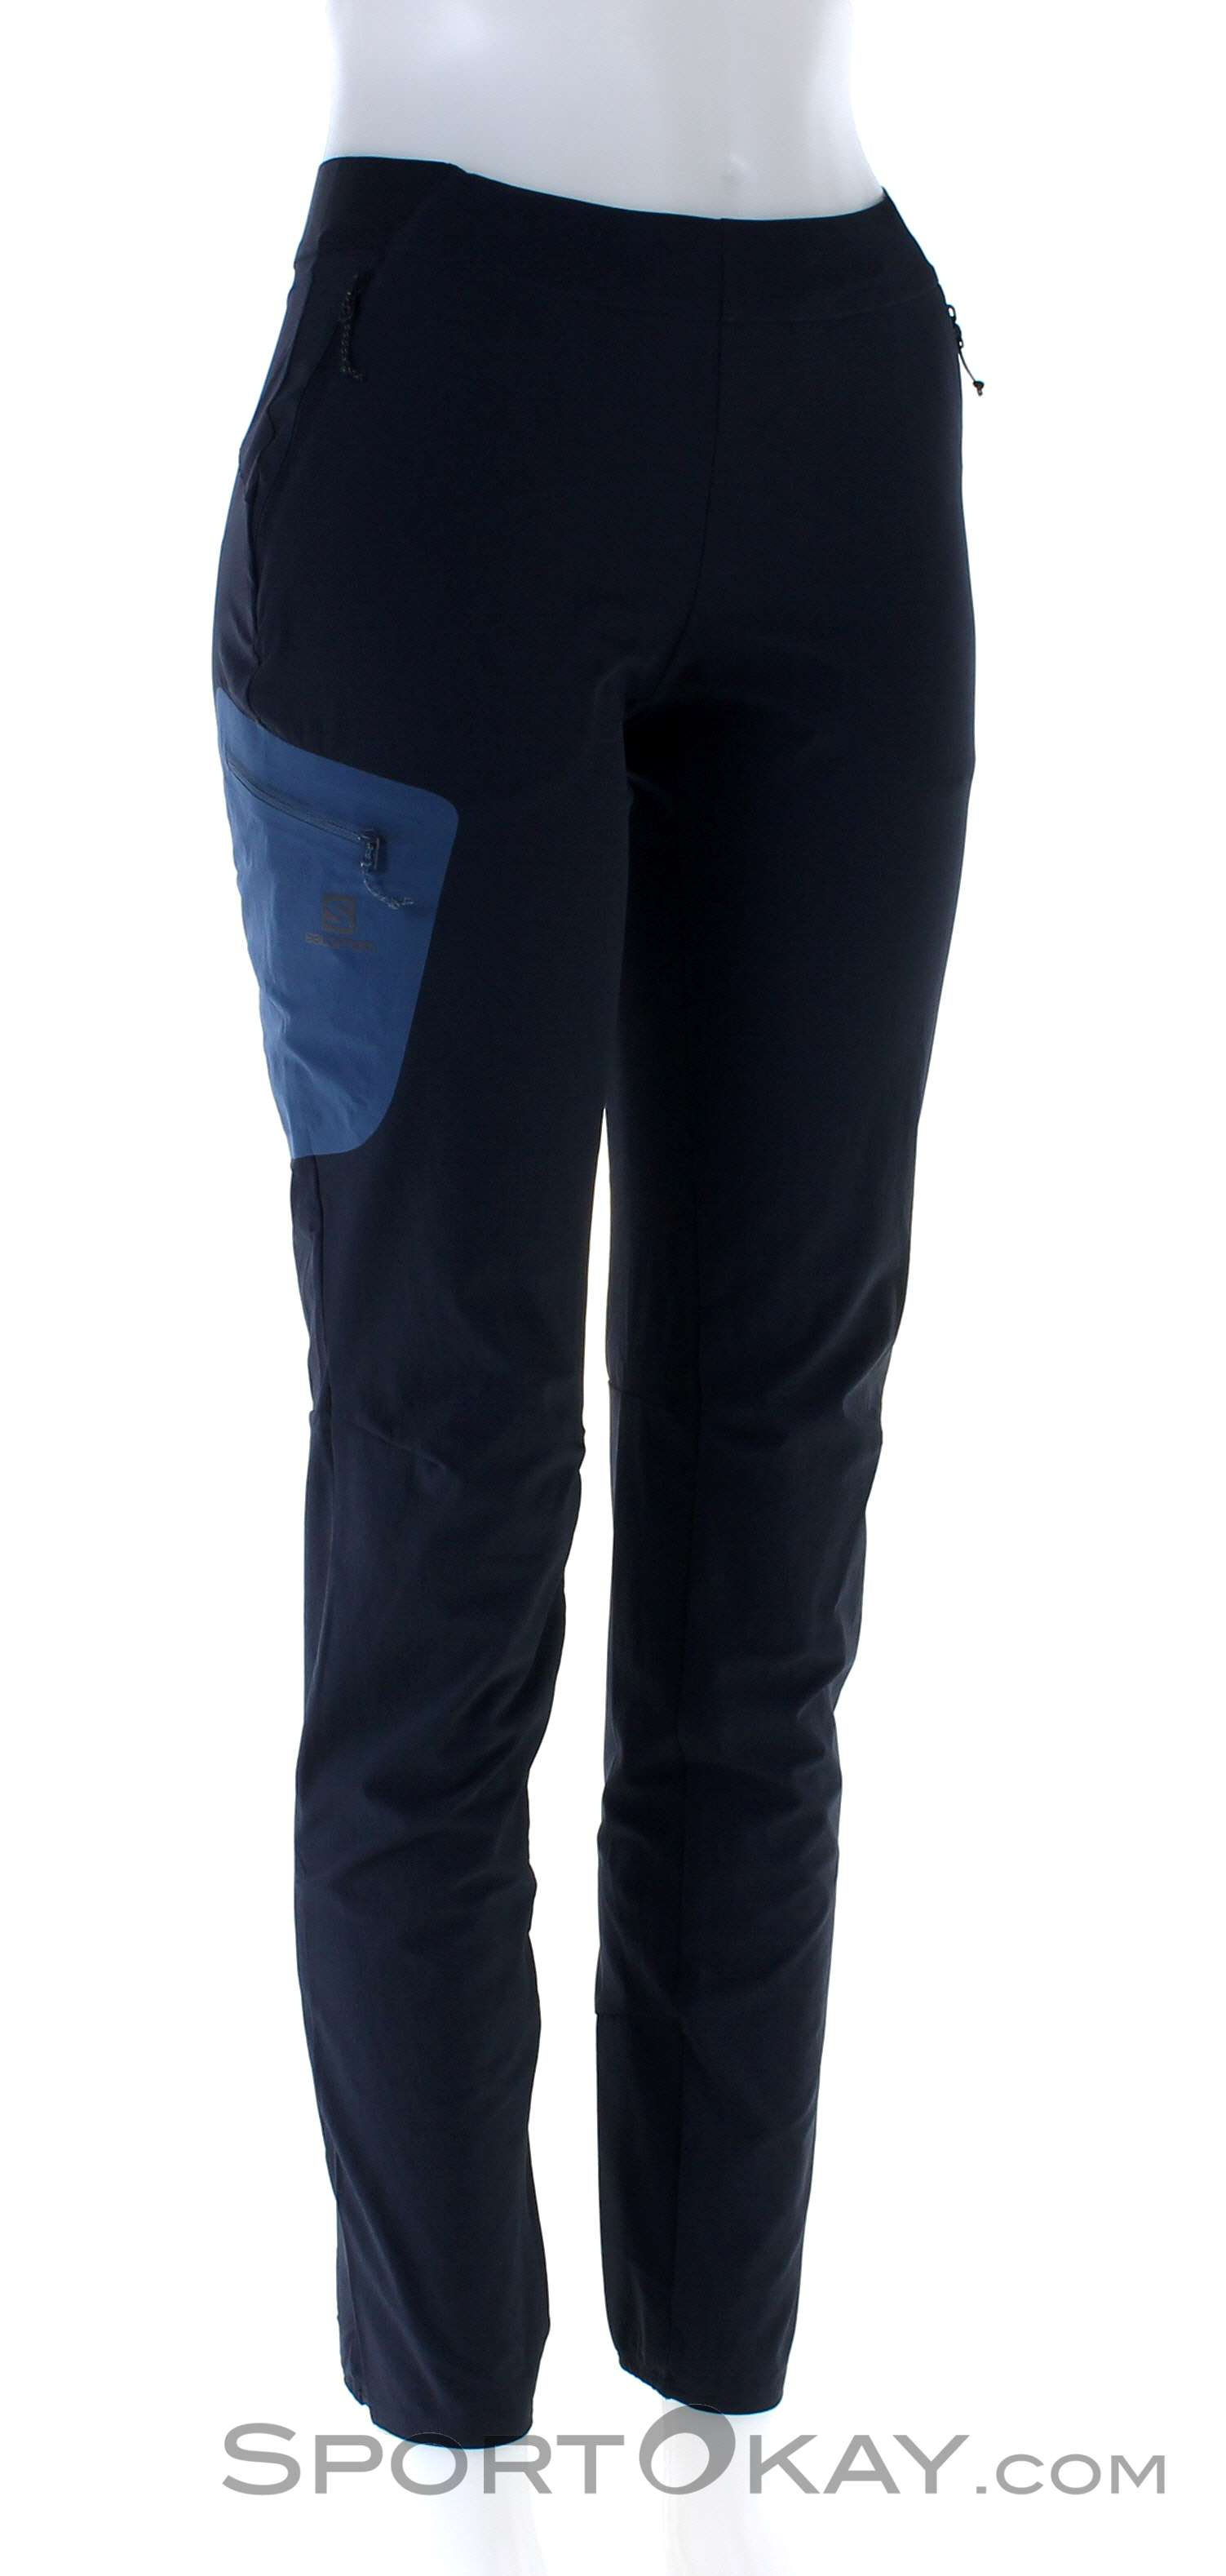 Salomon Wayfarer Alpine Pant Womens Outdoor Pants Pants NwmMR